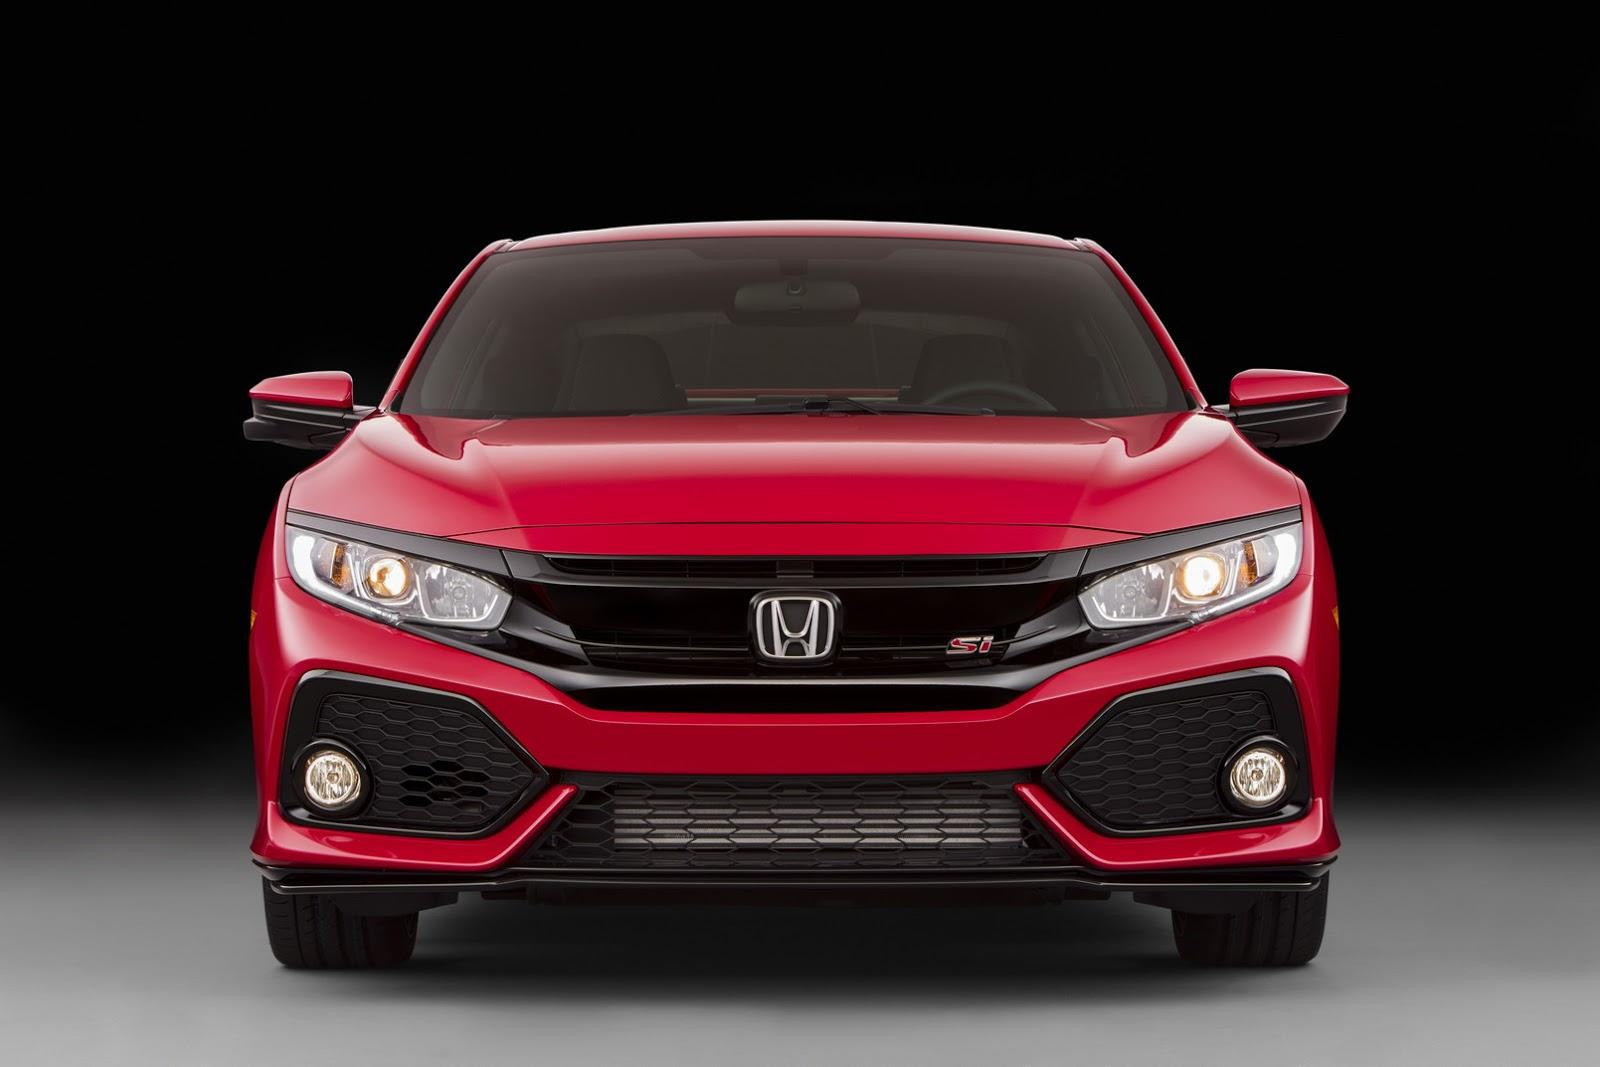 2017 Honda Civic Si Revealed With 1 5 Liter Turbo Engine